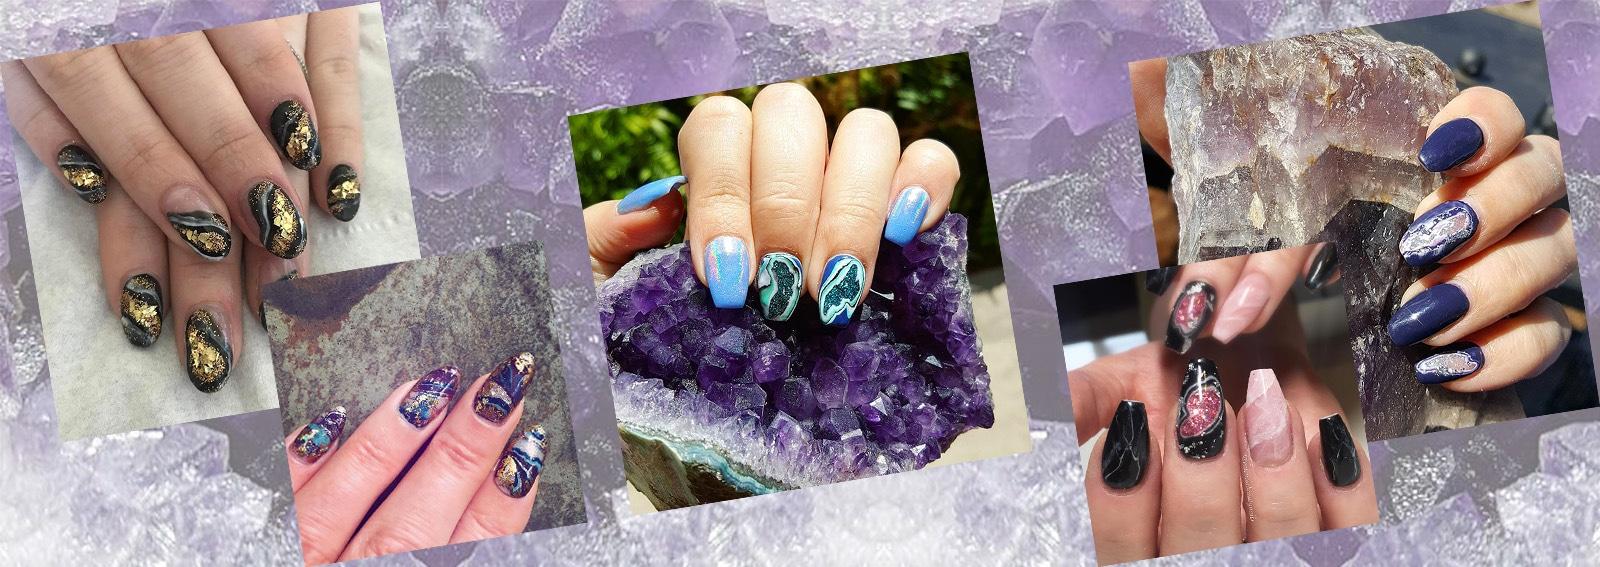 geode-nails-il-trend-nail-art-desktop